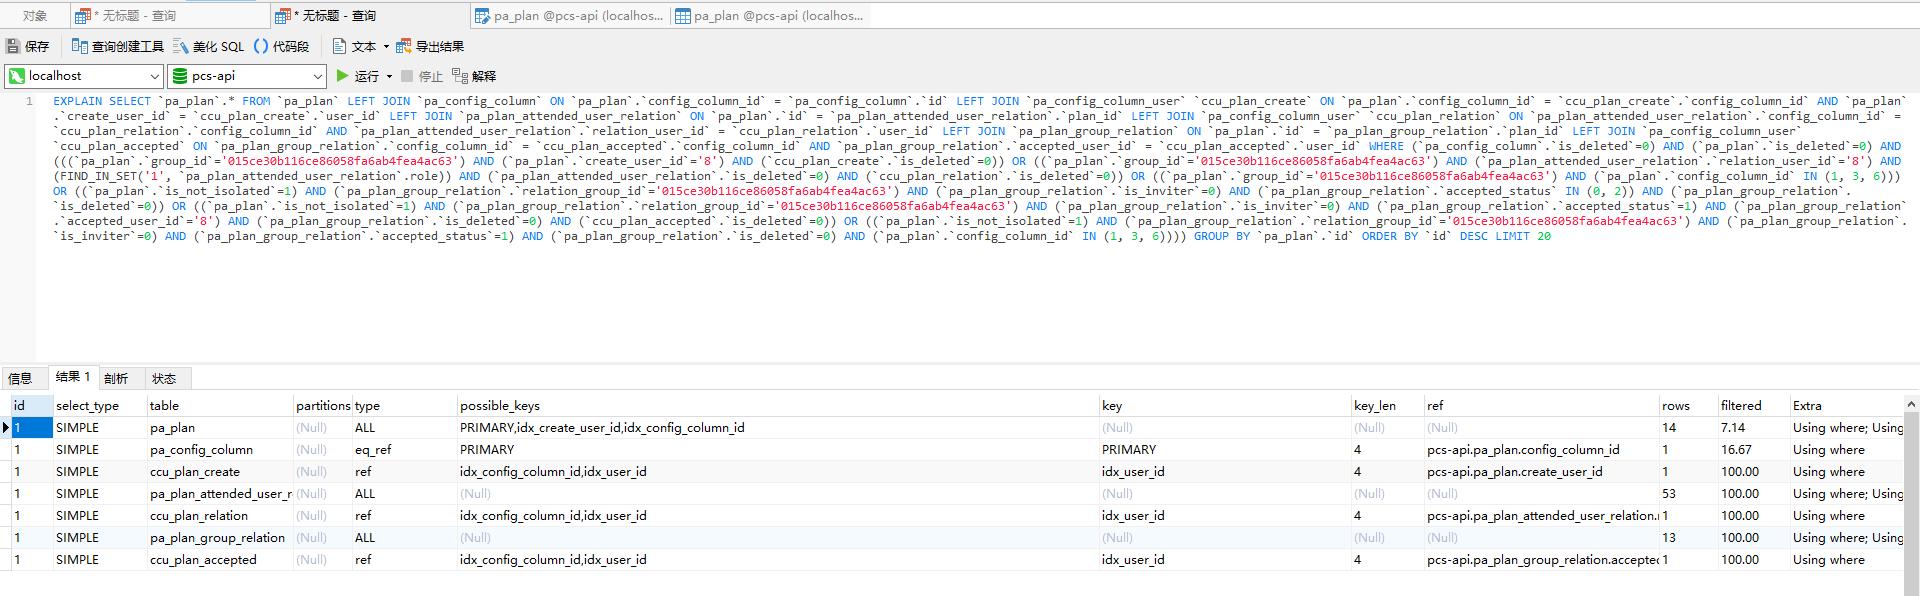 基于 Explain 分析 第 2 条 SQL 如下